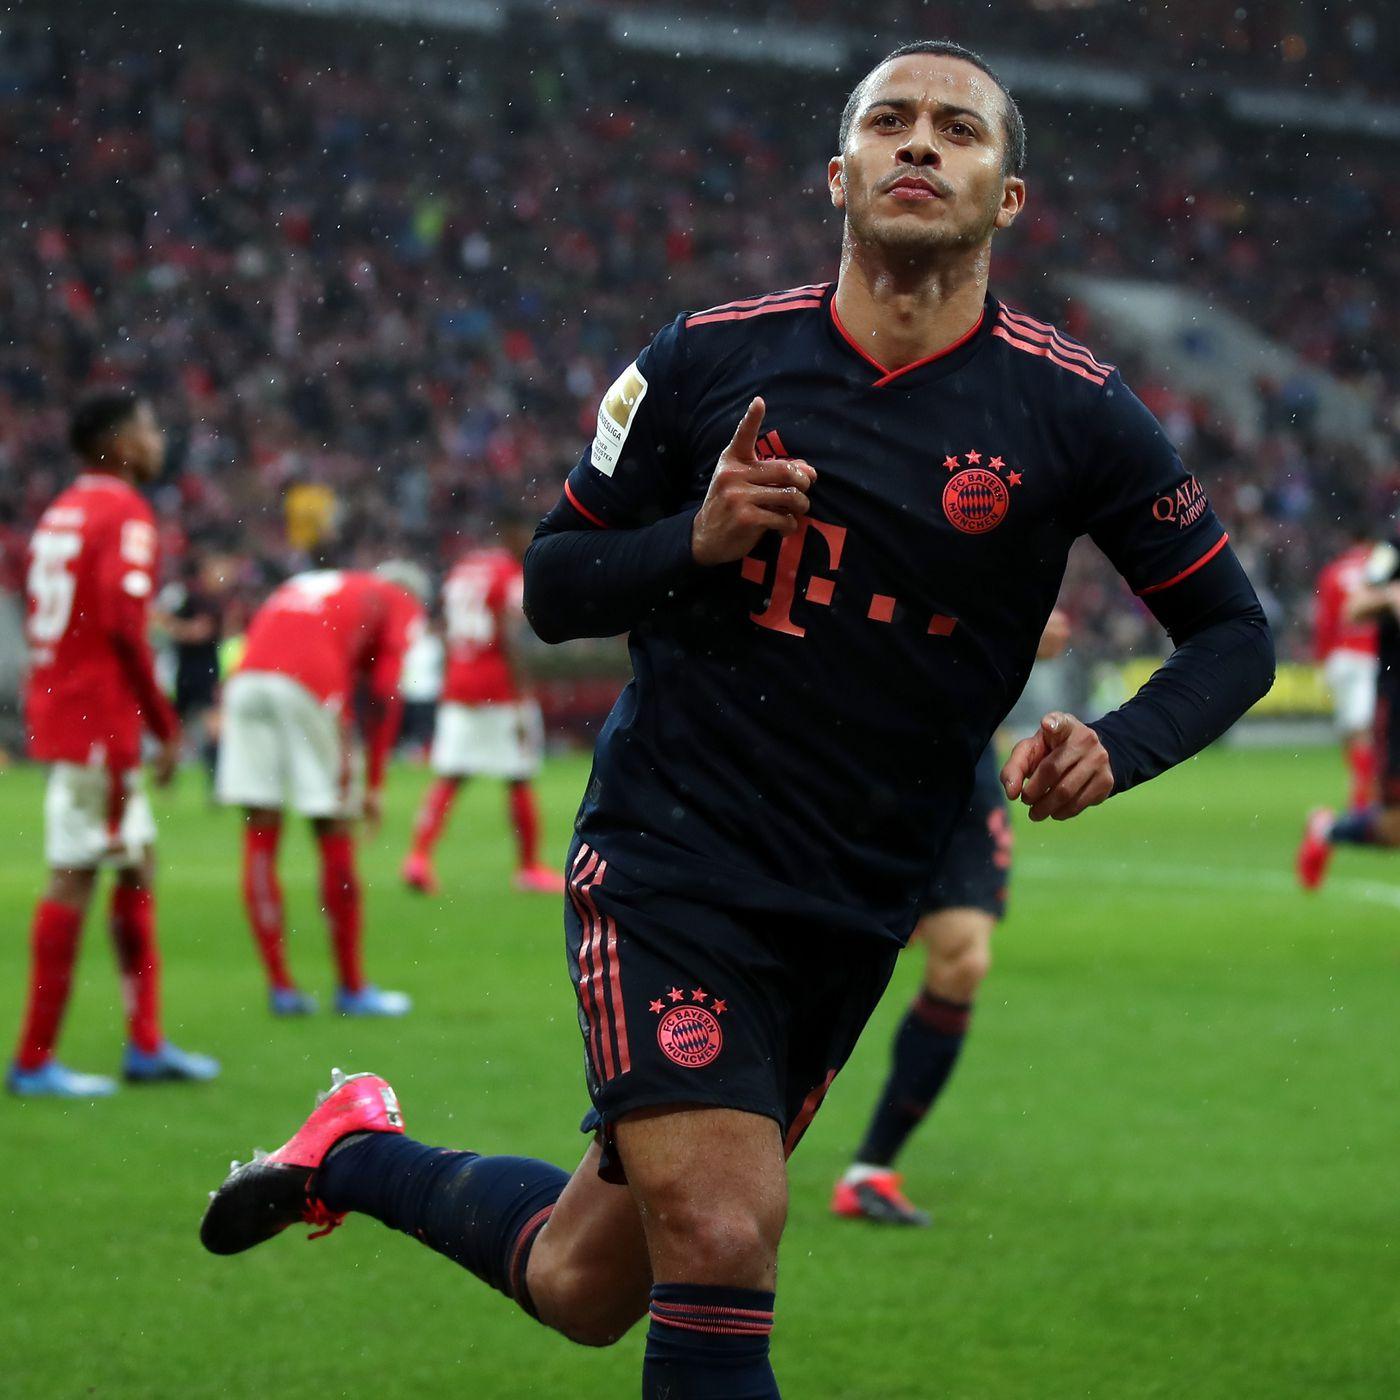 Zero chance Thiago Alcantara might return to Barca - Bavarian ...